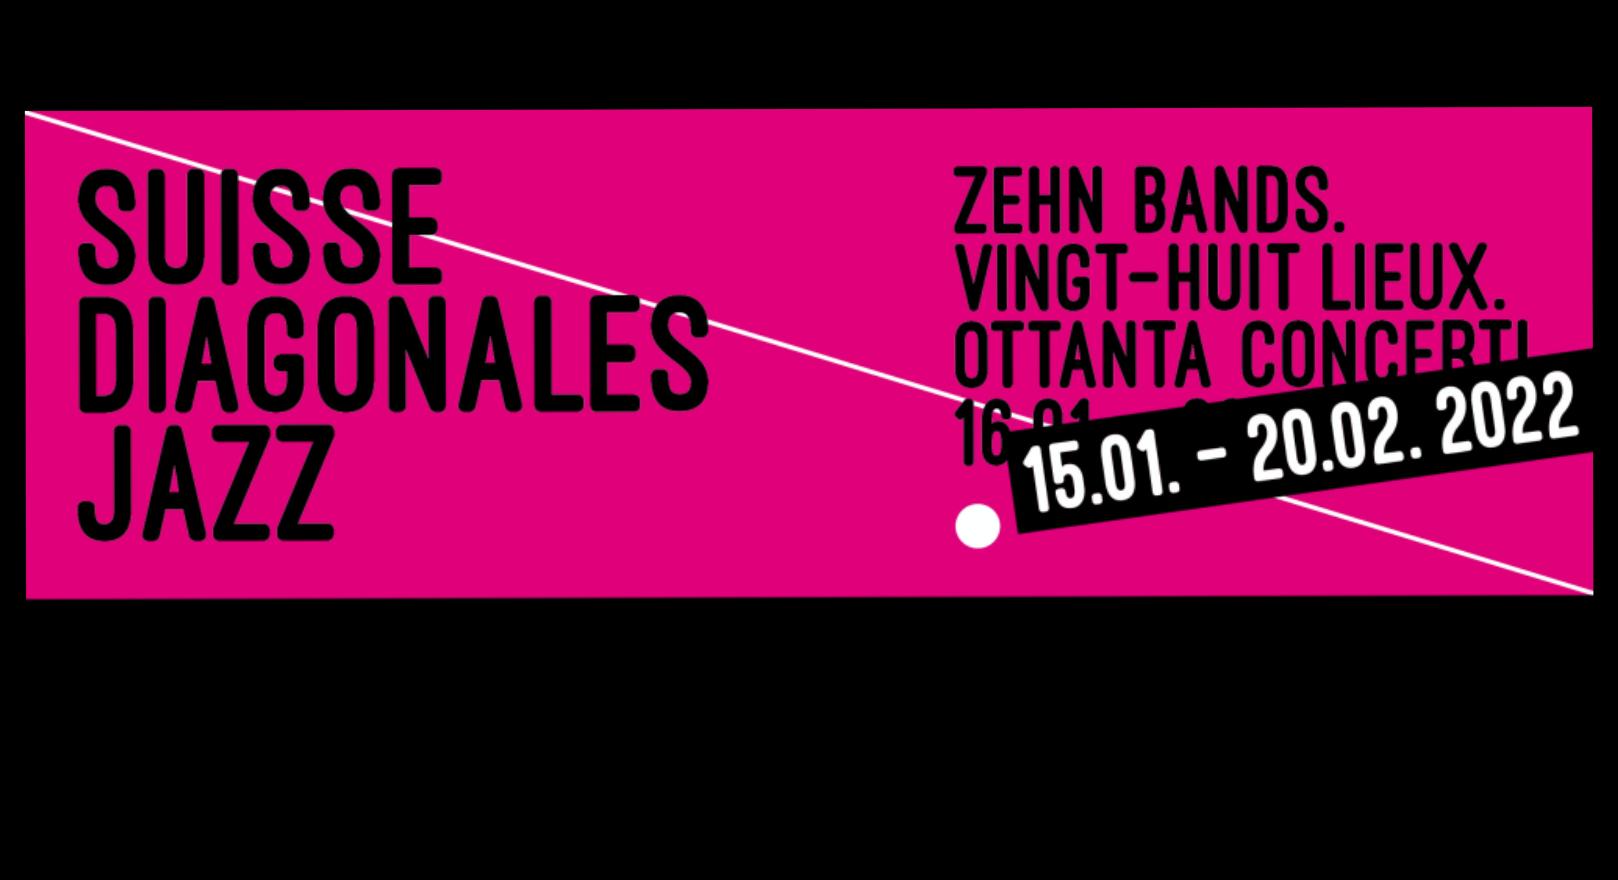 SUISSE DIAGONALES  JAZZ: Festival auf 2022 verschoben